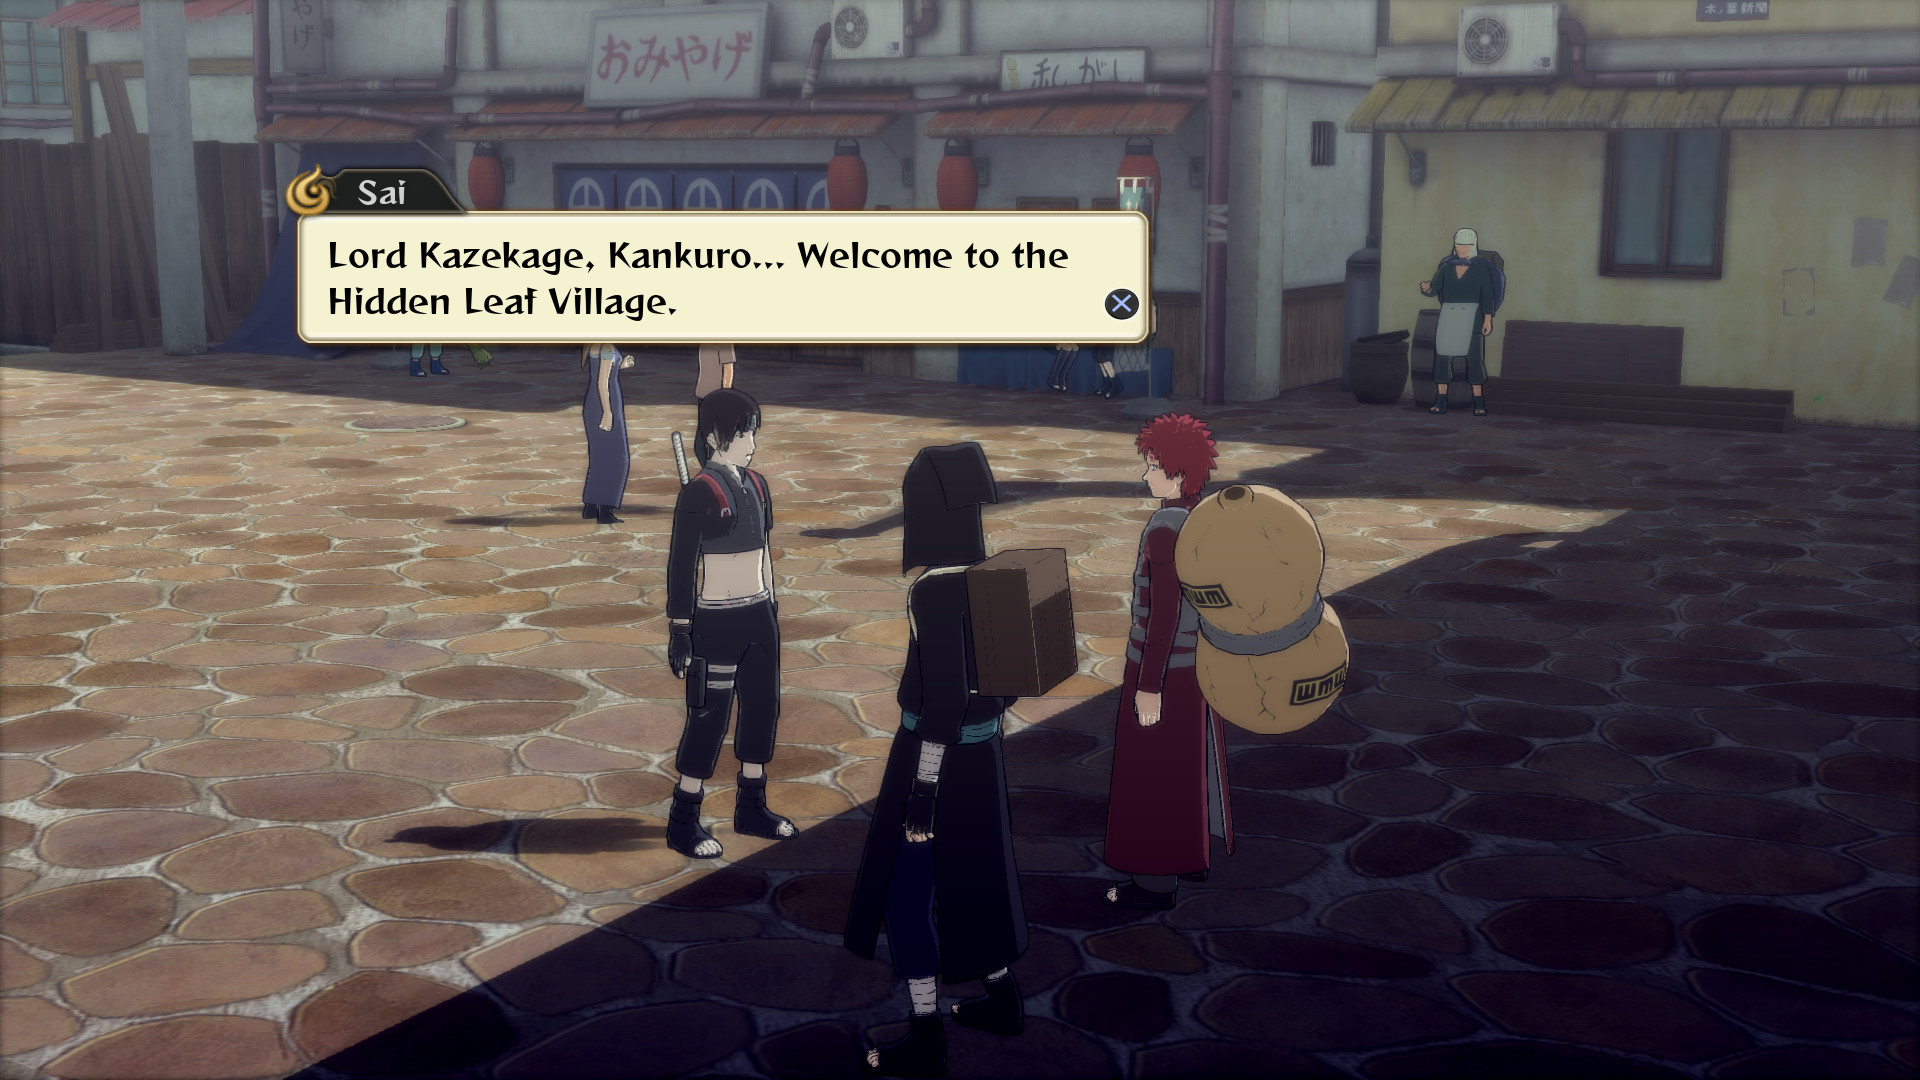 NARUTO SHIPPUDEN: Ultimate Ninja STORM 4 - Gaara's Tale Extra Scenario Pack screenshot